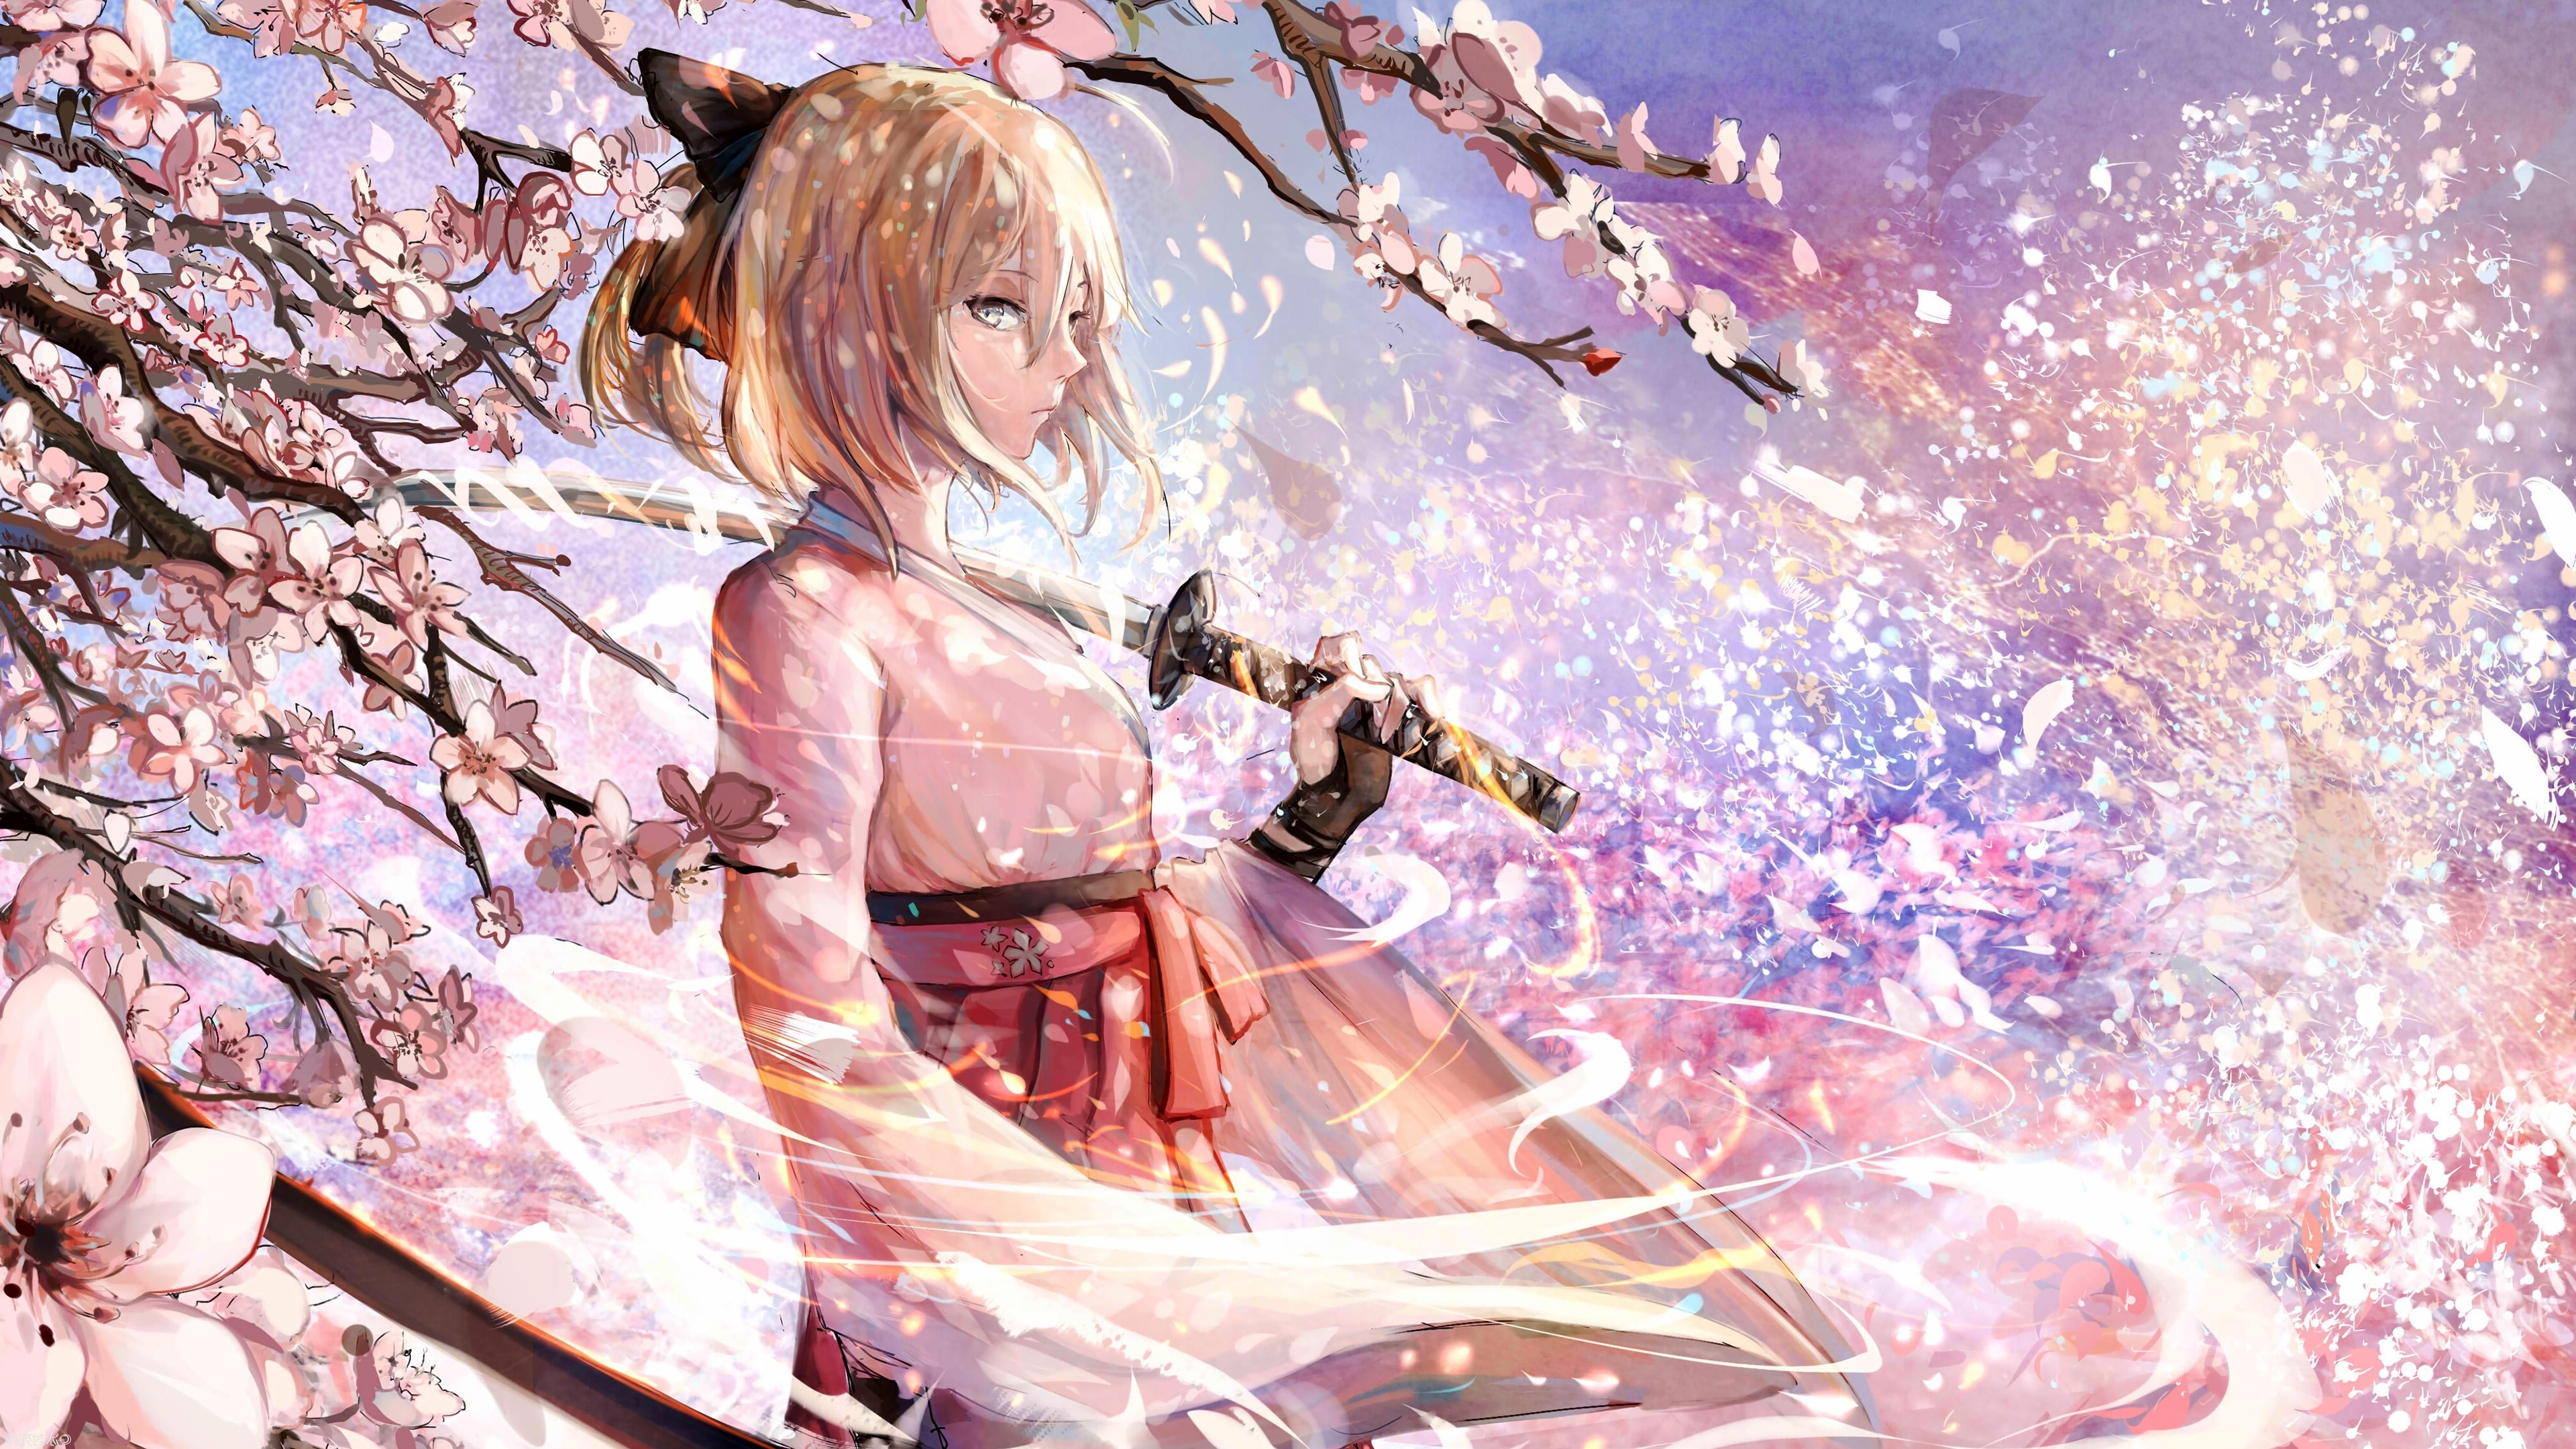 Anime girl with sword